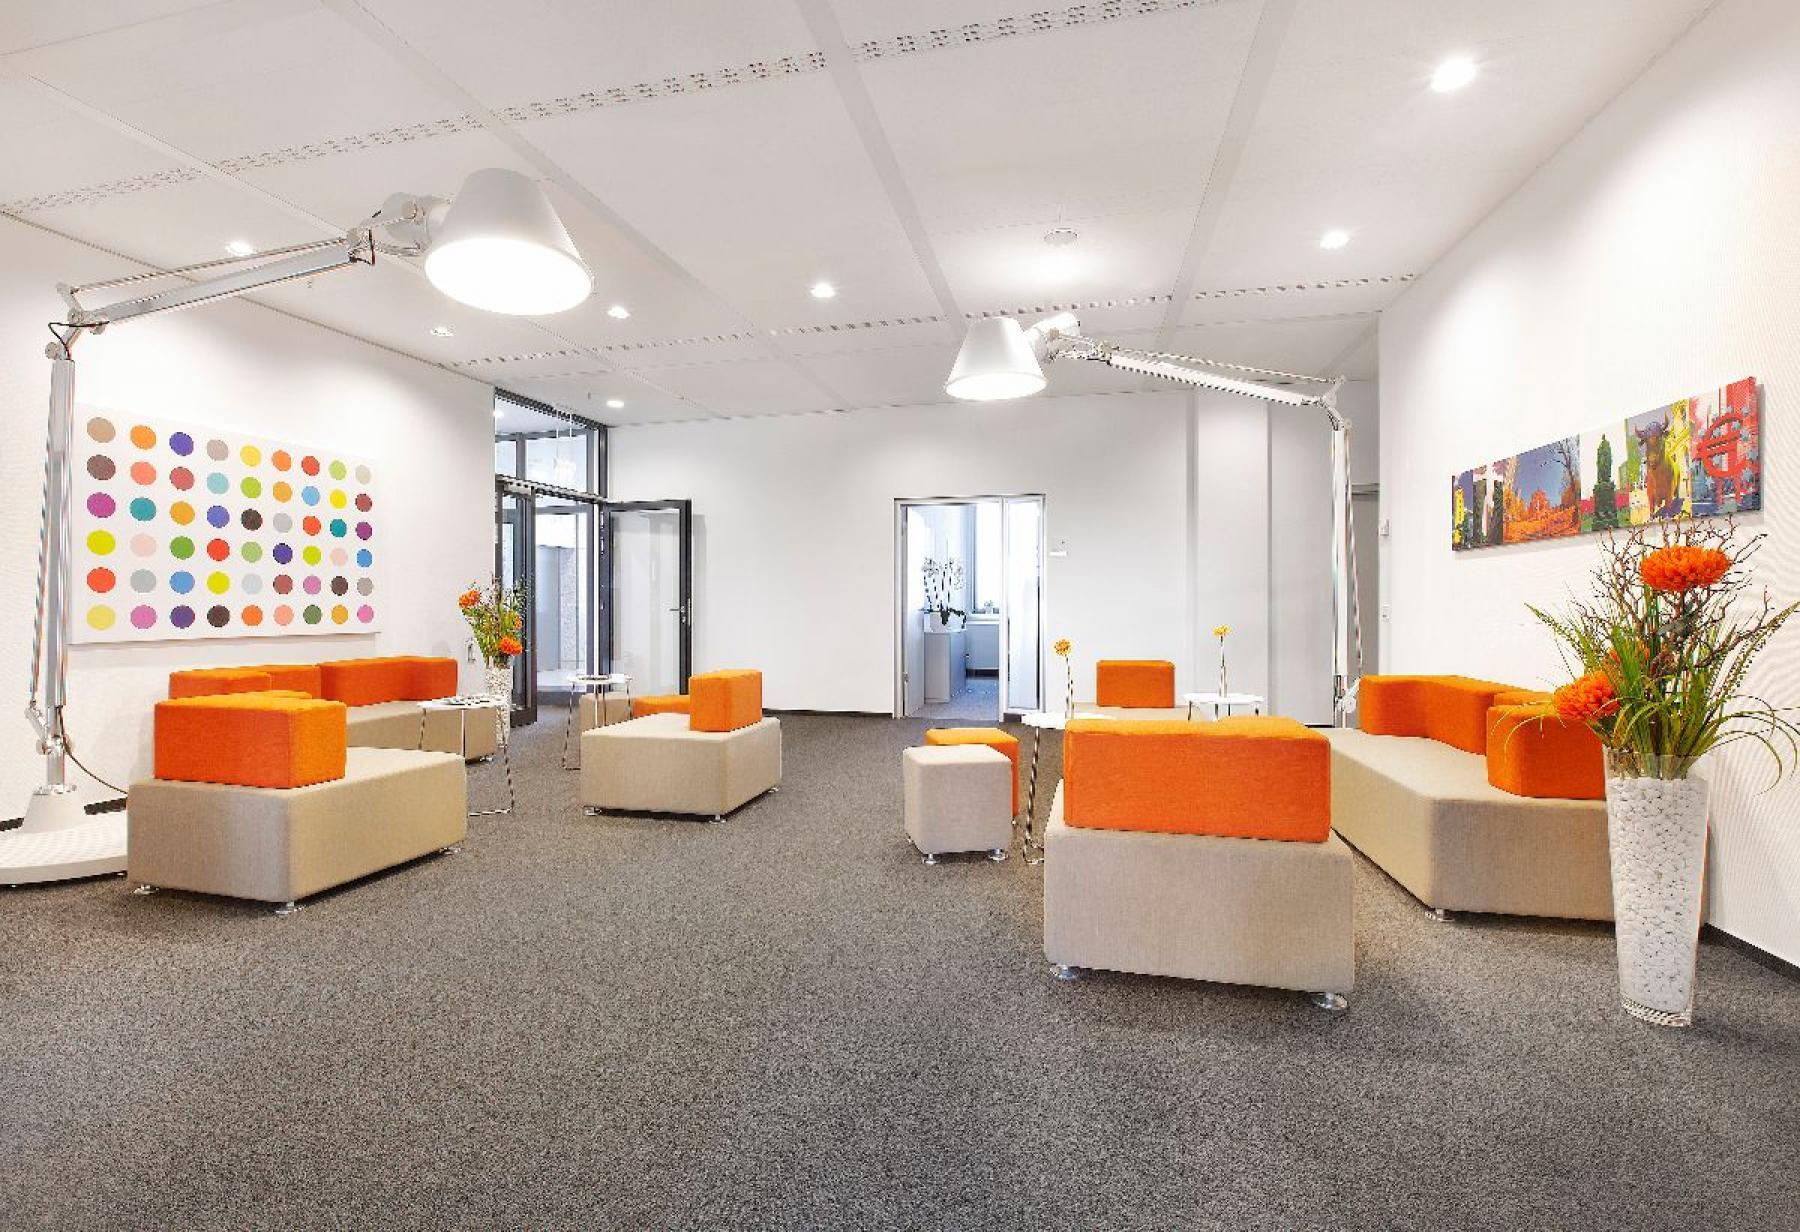 Büroraum mieten in der geschmackvollen Büroimmobilie Frankfurt Bockenheim, Theodor-Heuss-Allee